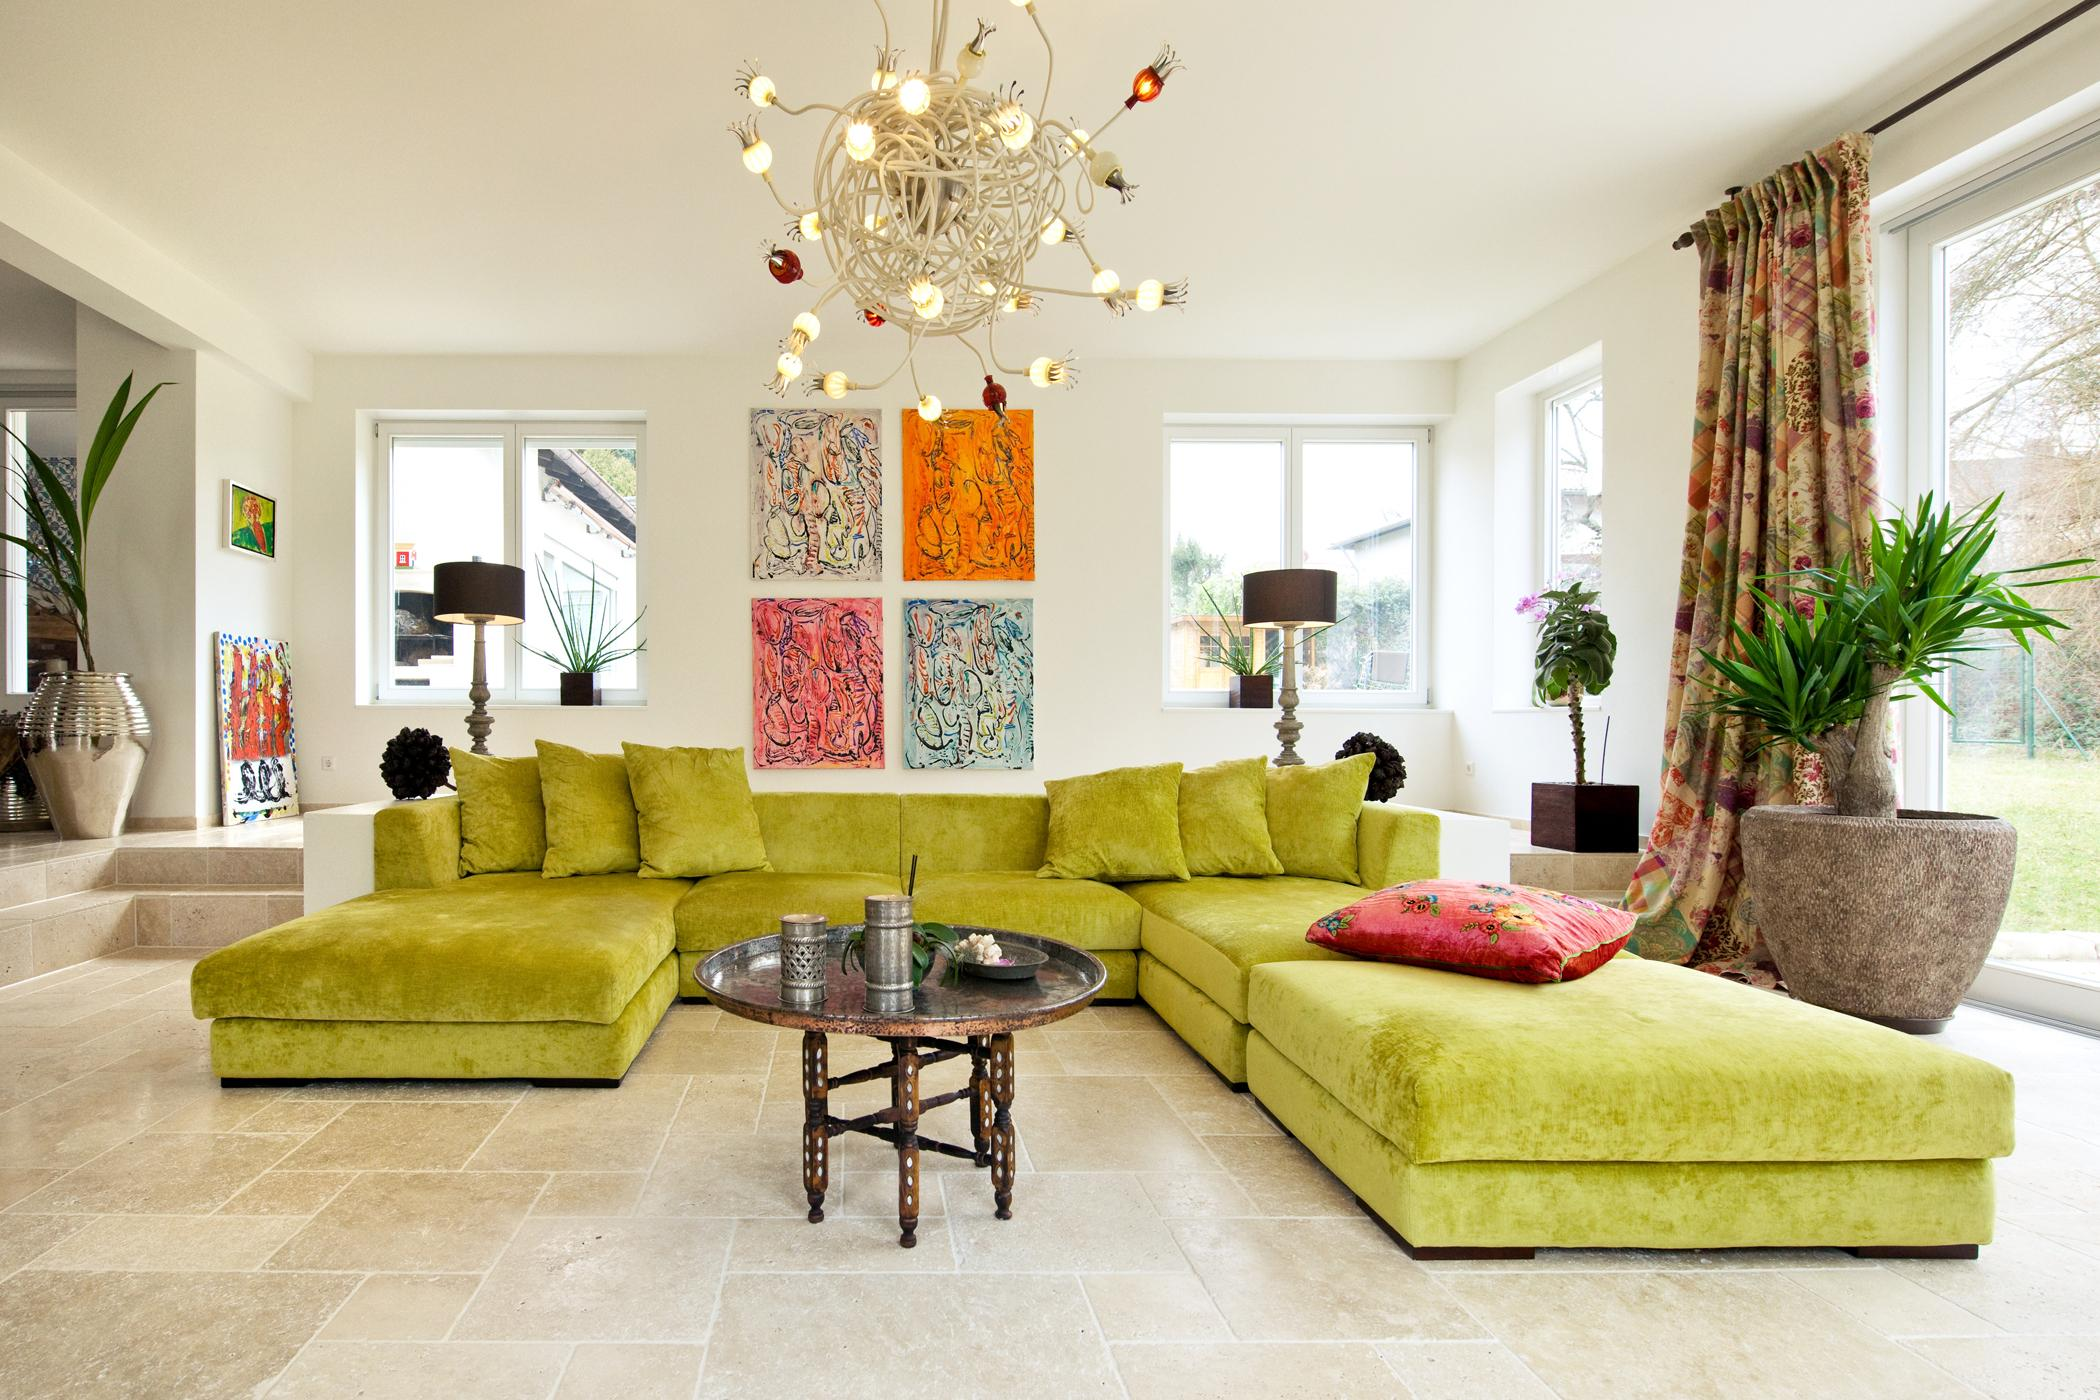 Full Size of Grünes Sofa Big Xxl Chesterfield Rundes Tom Tailor überwurf Garnitur 2 Teilig Rund Günstig Grau Langes 3 Sitzer Sofa Grünes Sofa